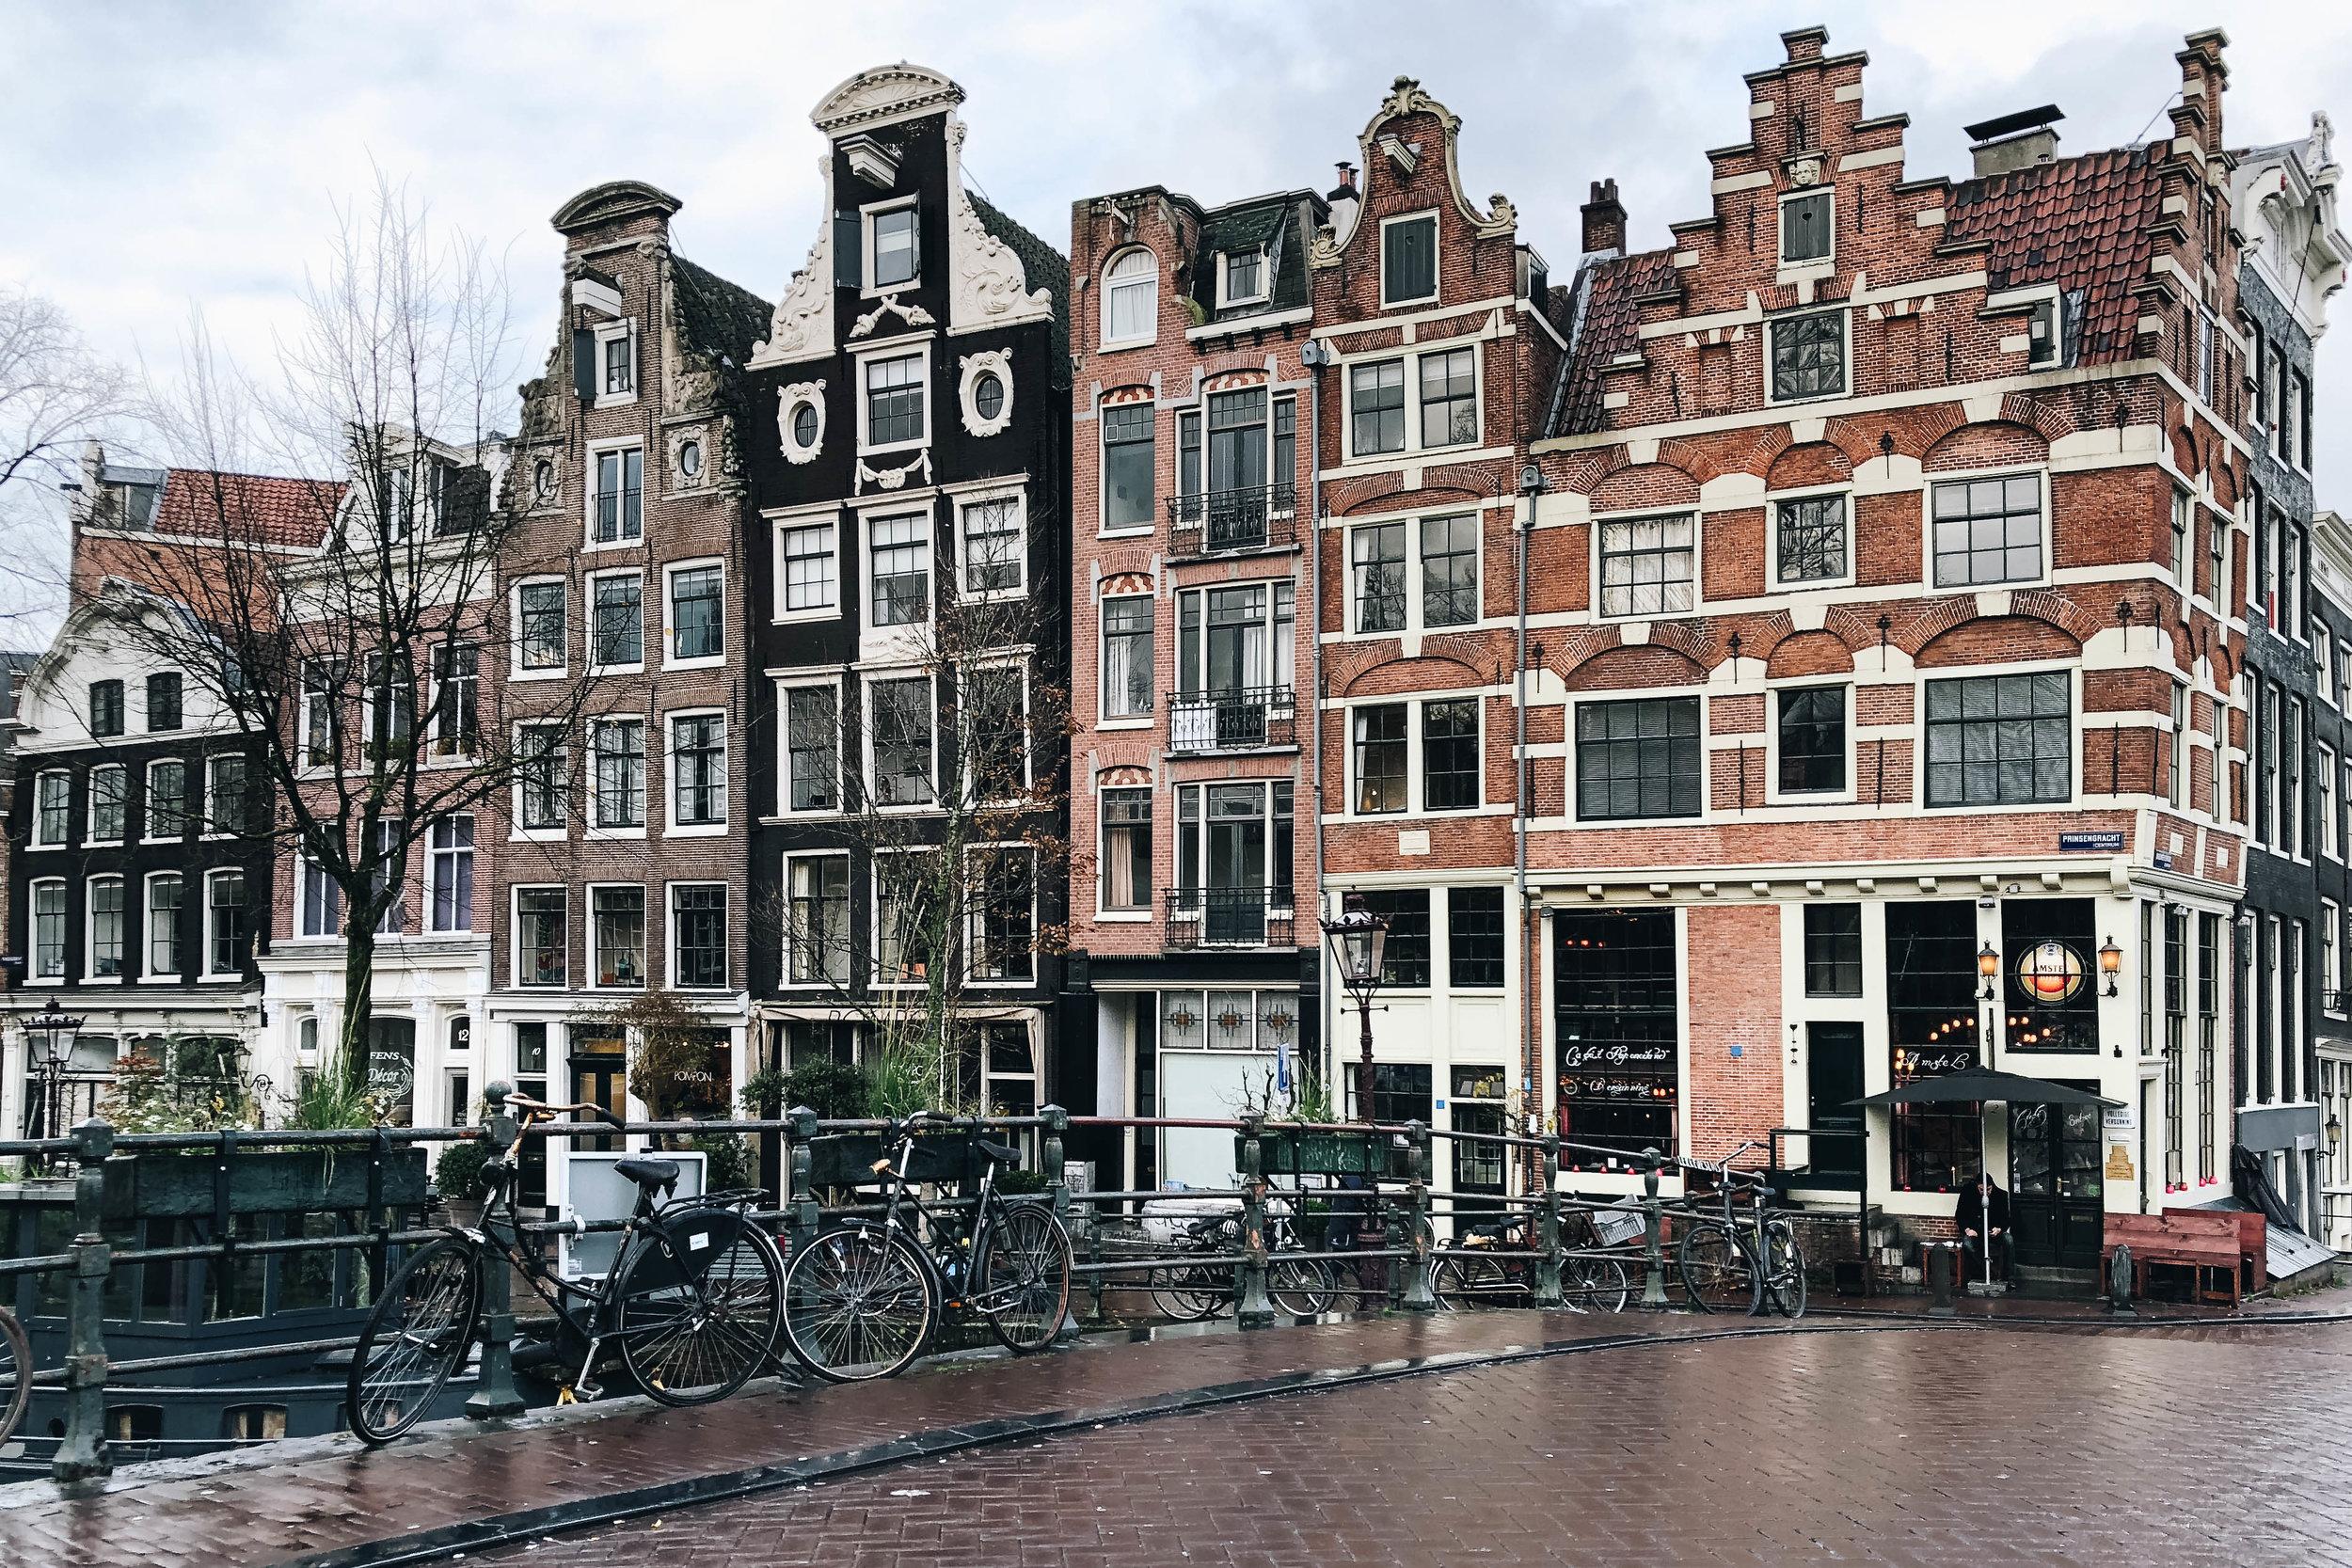 Amsterdam canal2.jpg